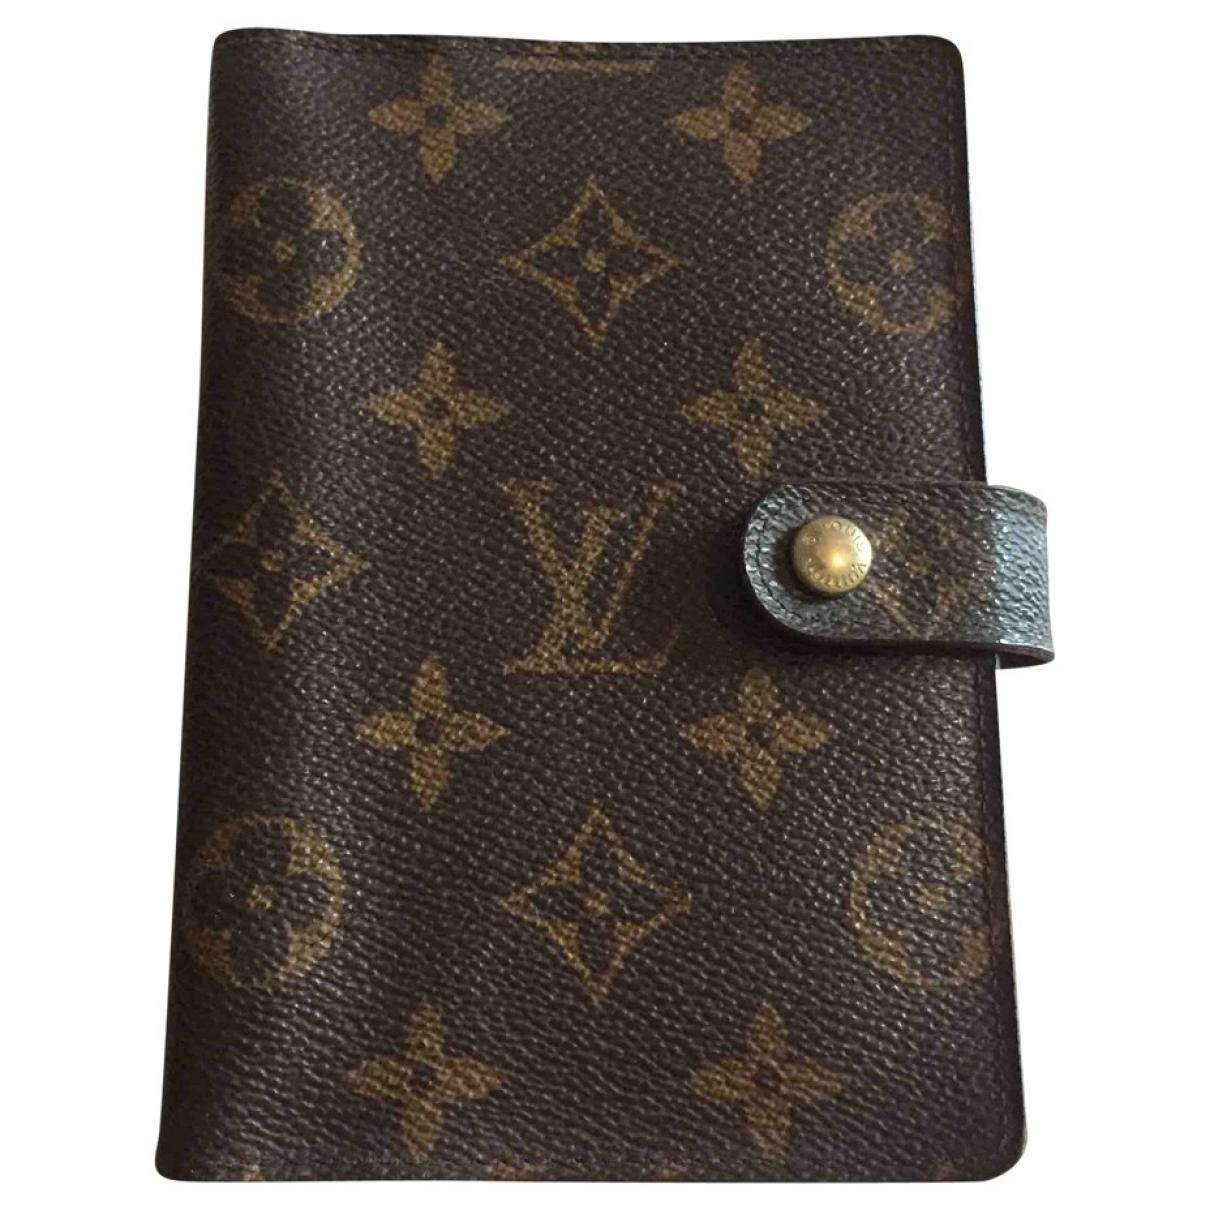 Louis Vuitton Couverture d'agenda PM Brown Cloth Home decor for Life & Living \N